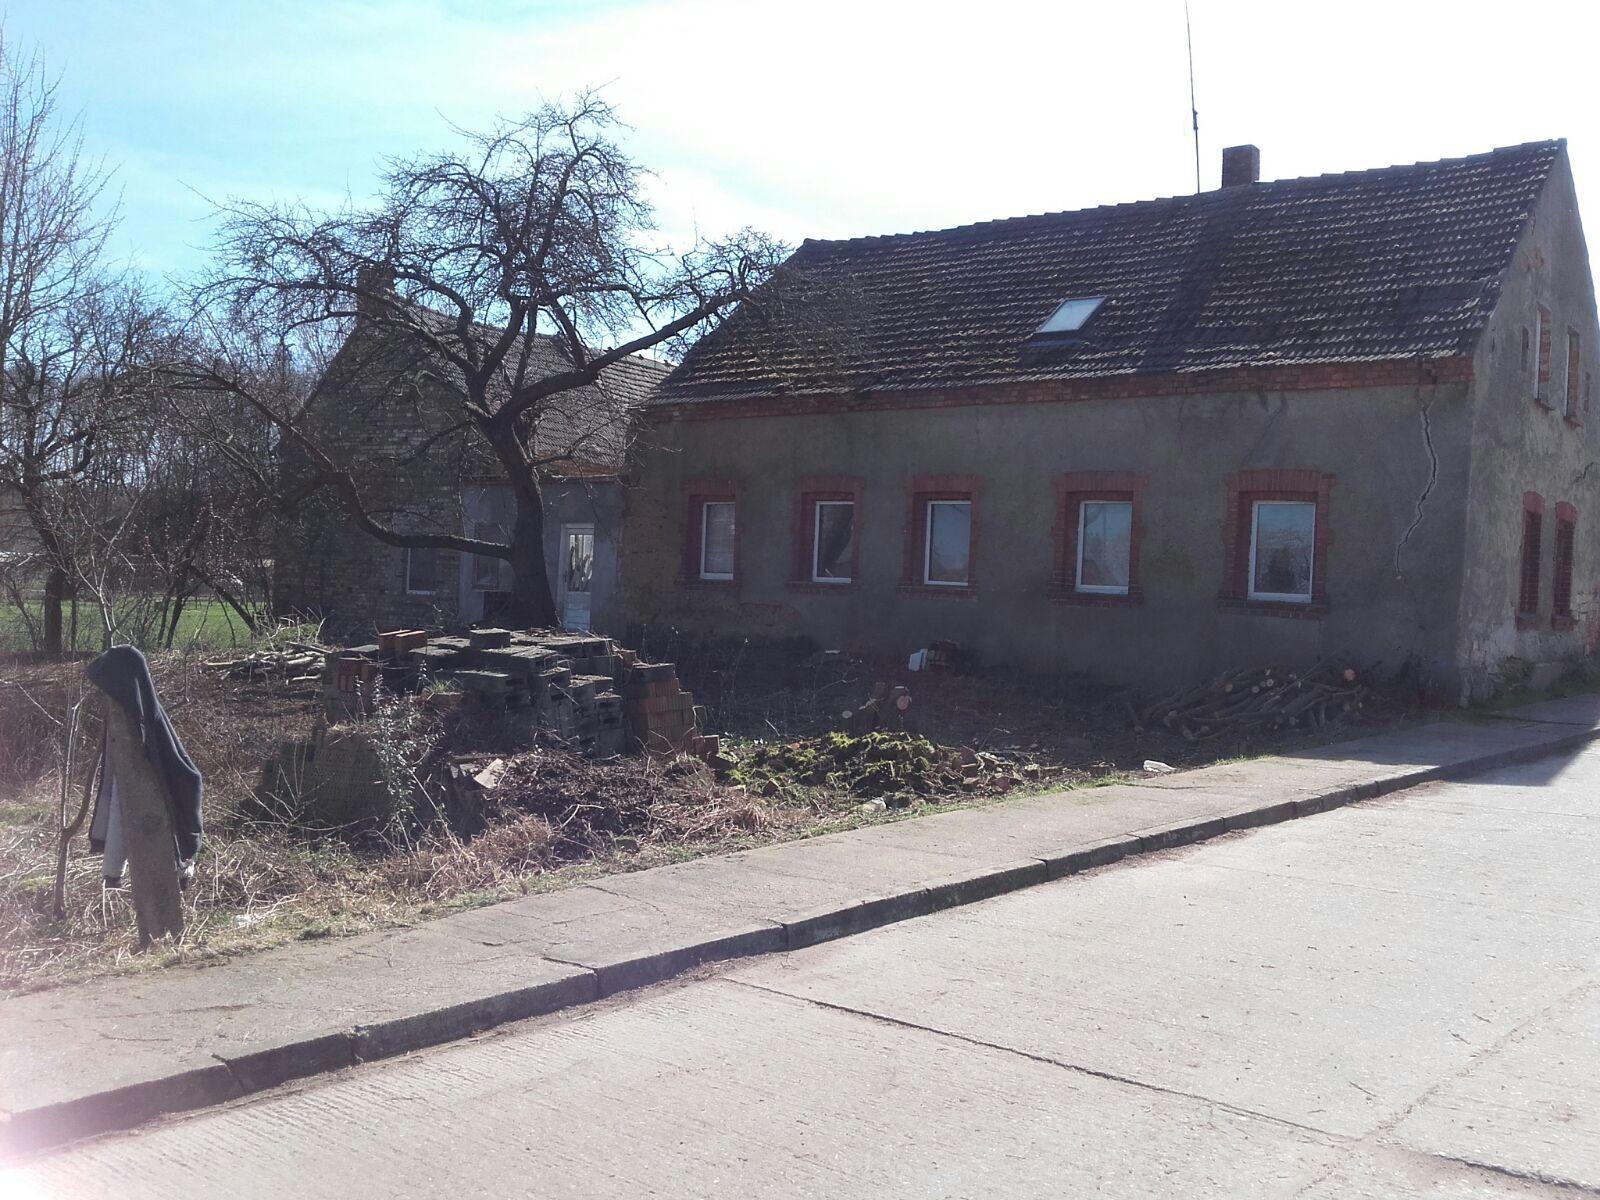 Wohnhaus, Baugrundstück, Abrissgrundstück am Rand der Dübener Heide 1400 qm